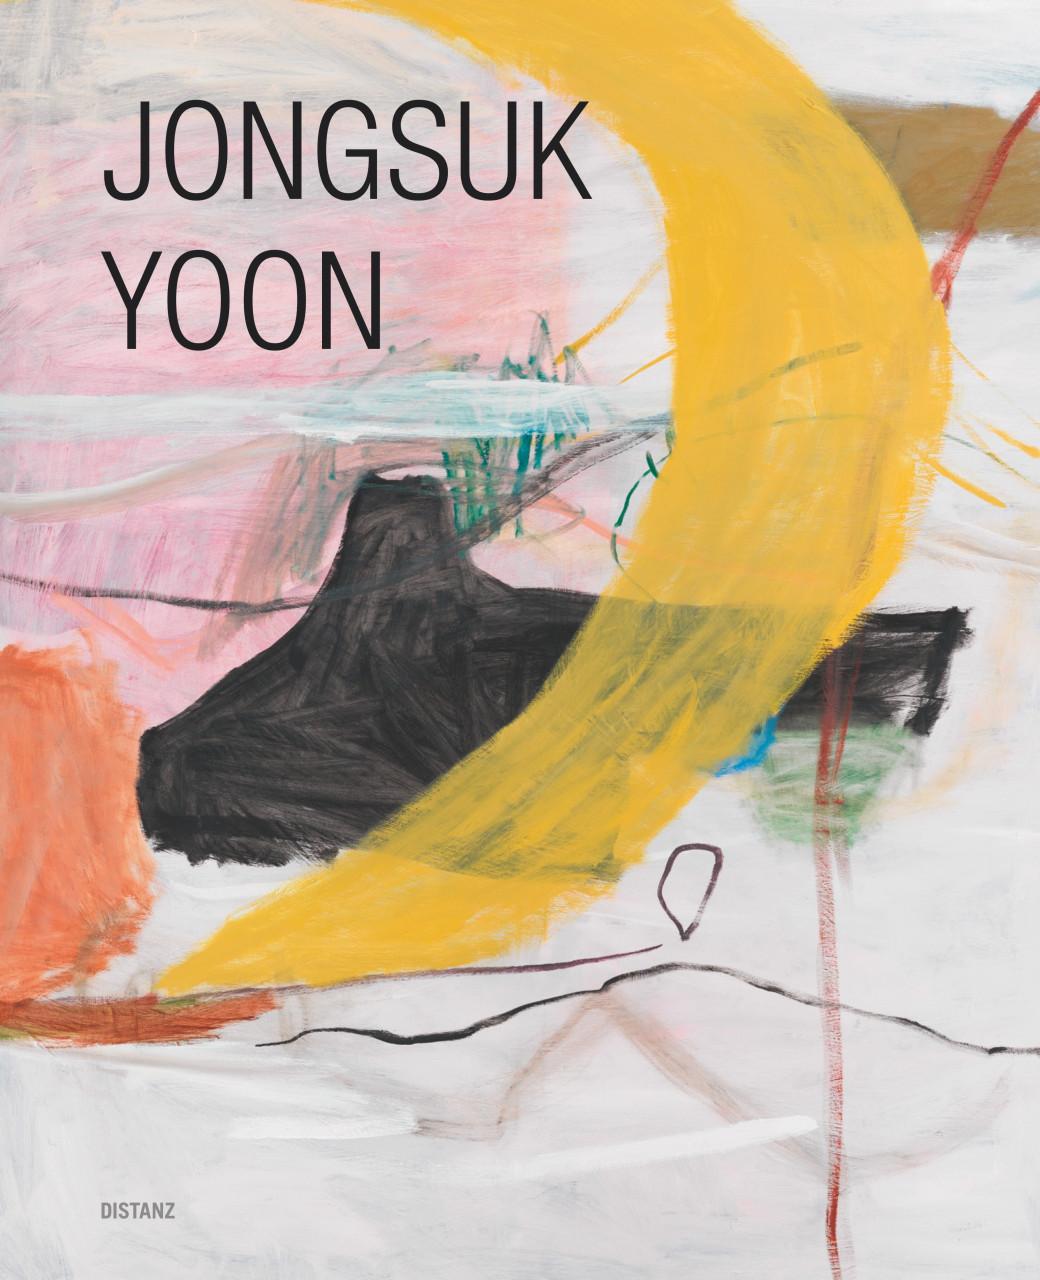 Shop Katalog Cover Buch Jonsuk Yoon